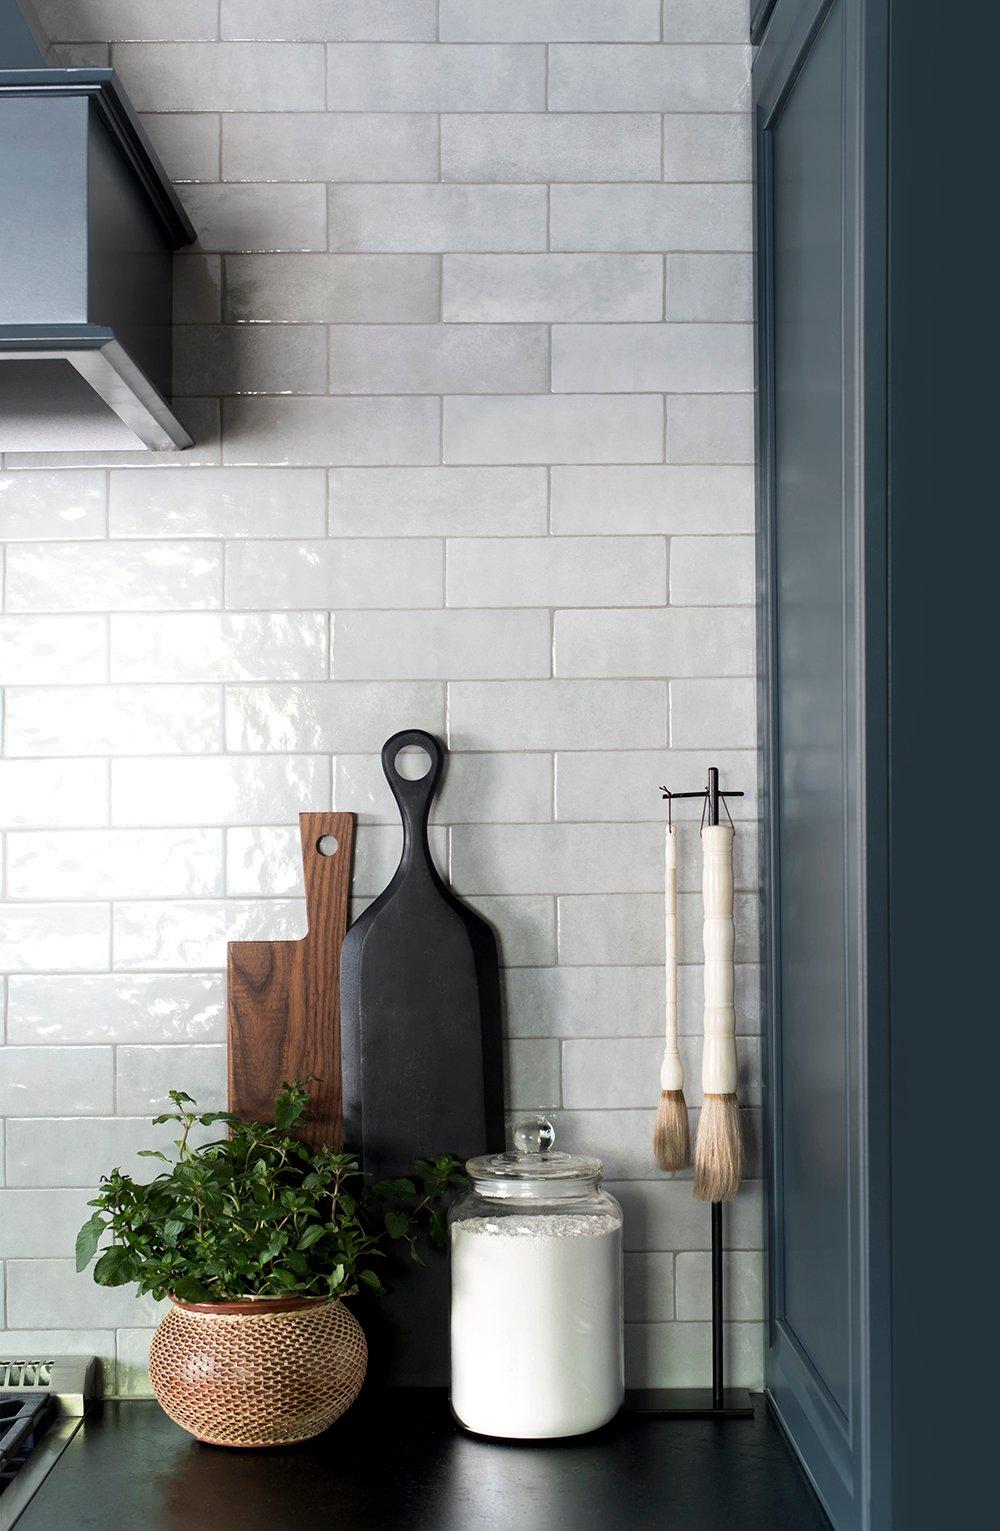 Bedrosians Cloe Backsplash Tile In Grey Room For Tuesday